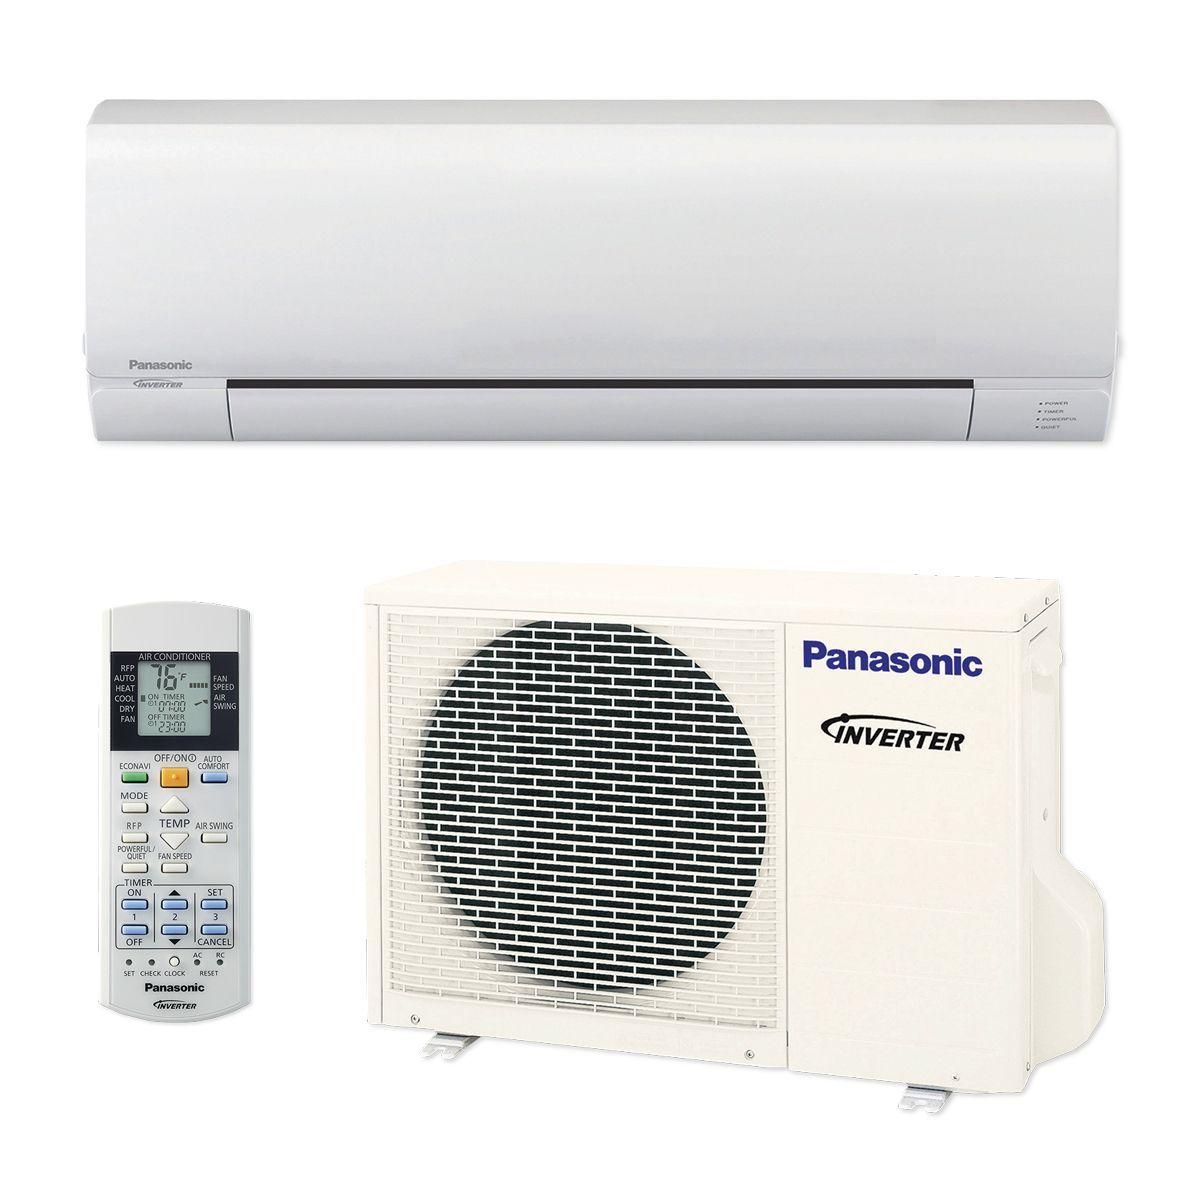 Panasonic® Re12skua 12,000 Btu 16 Seer Pro Series Wall